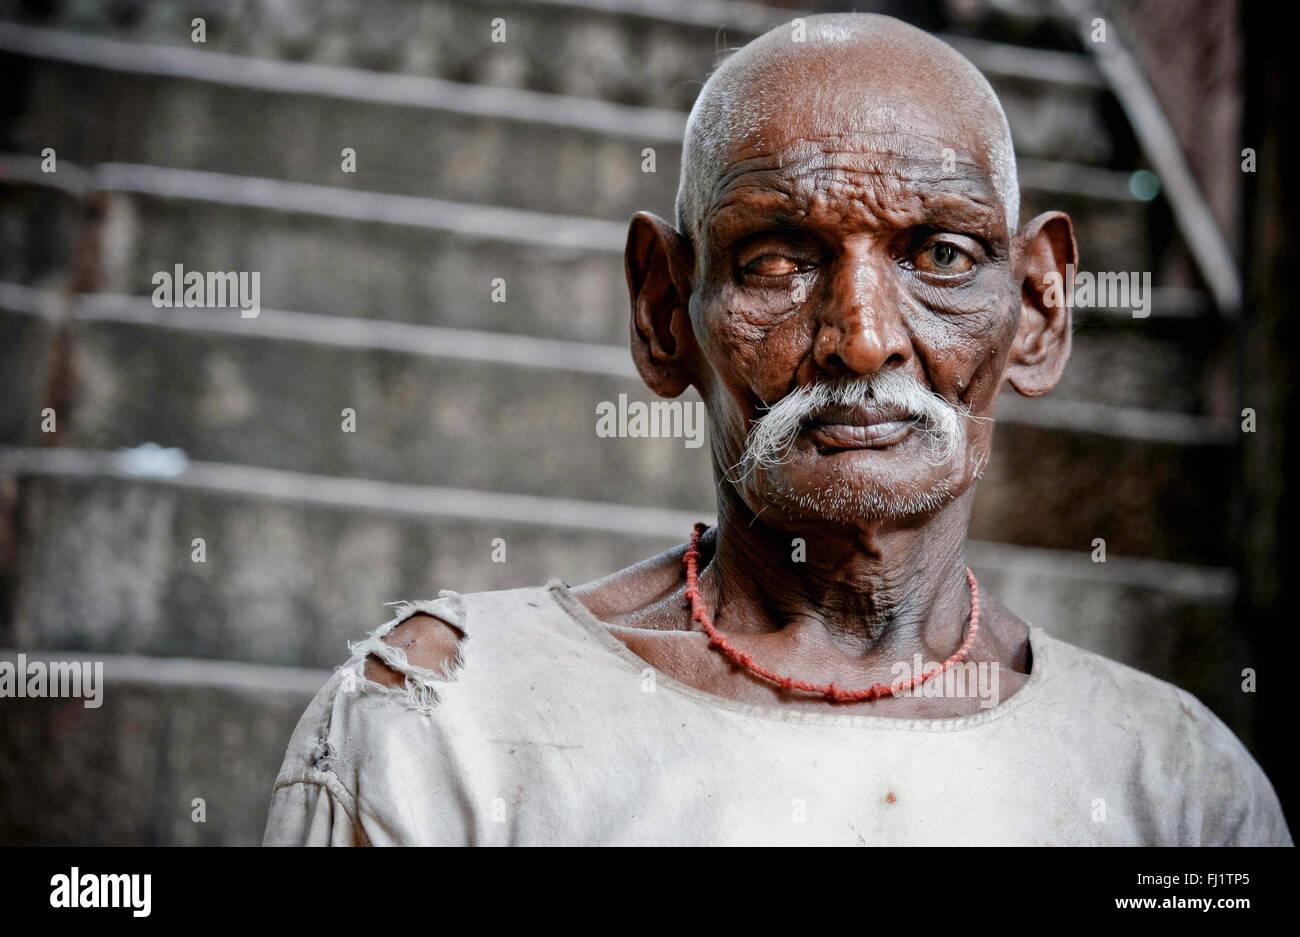 Indian beggar  in Hindu holy city Varanasi, India - Stock Image